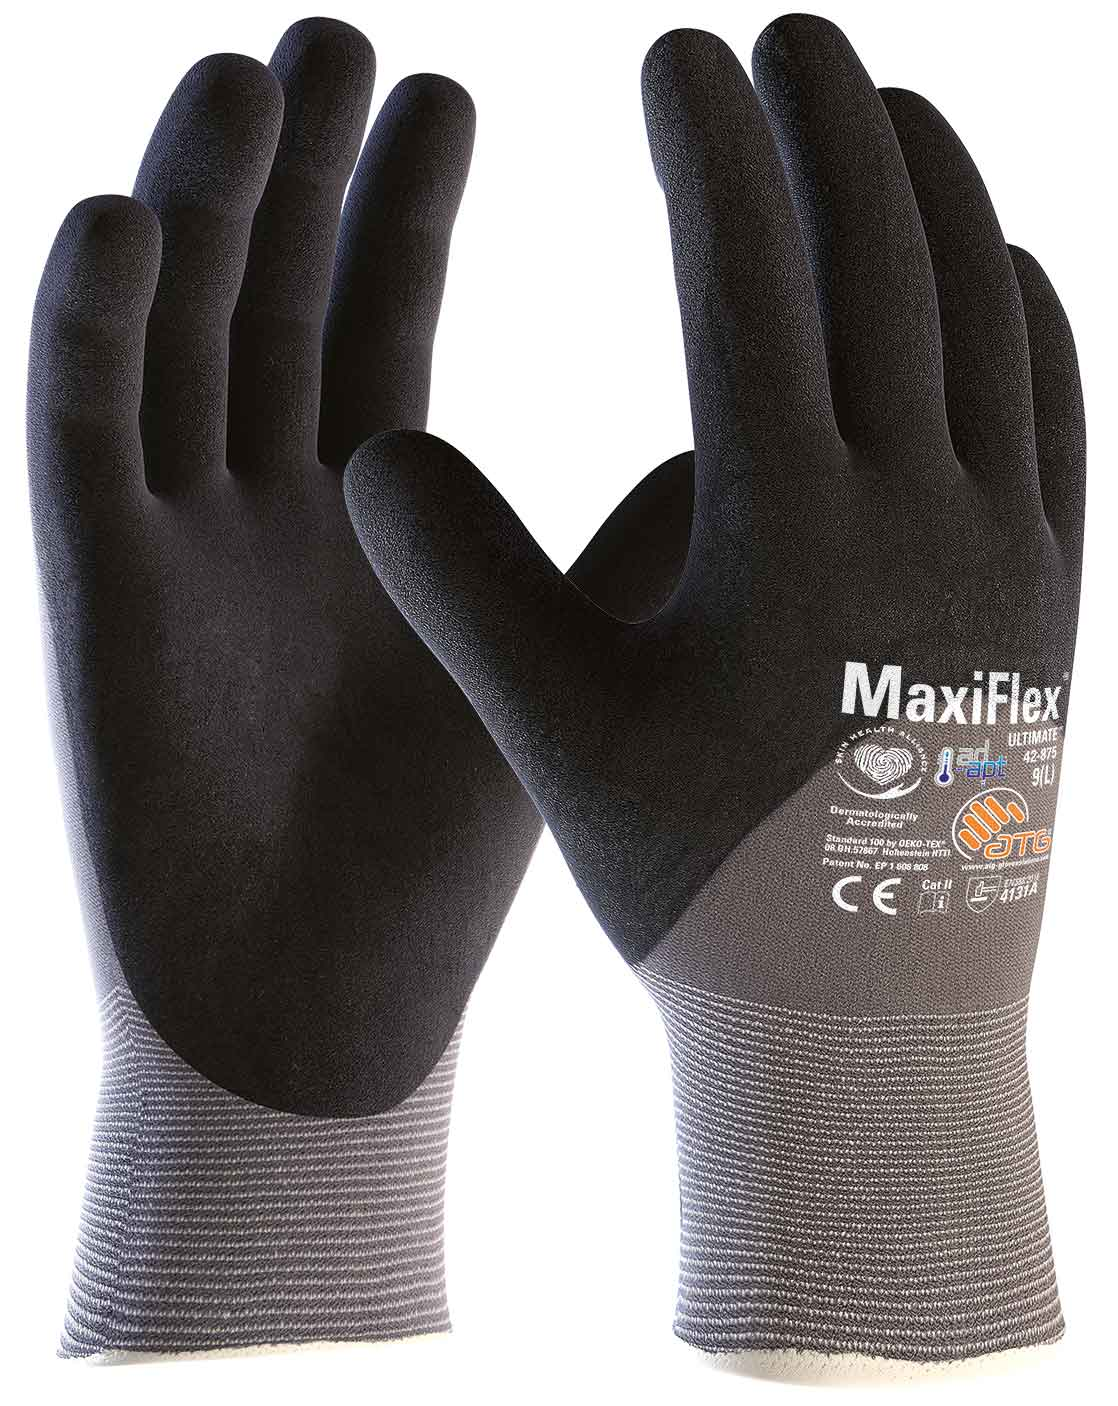 42-875 MaxiFlex® Ultimate Image